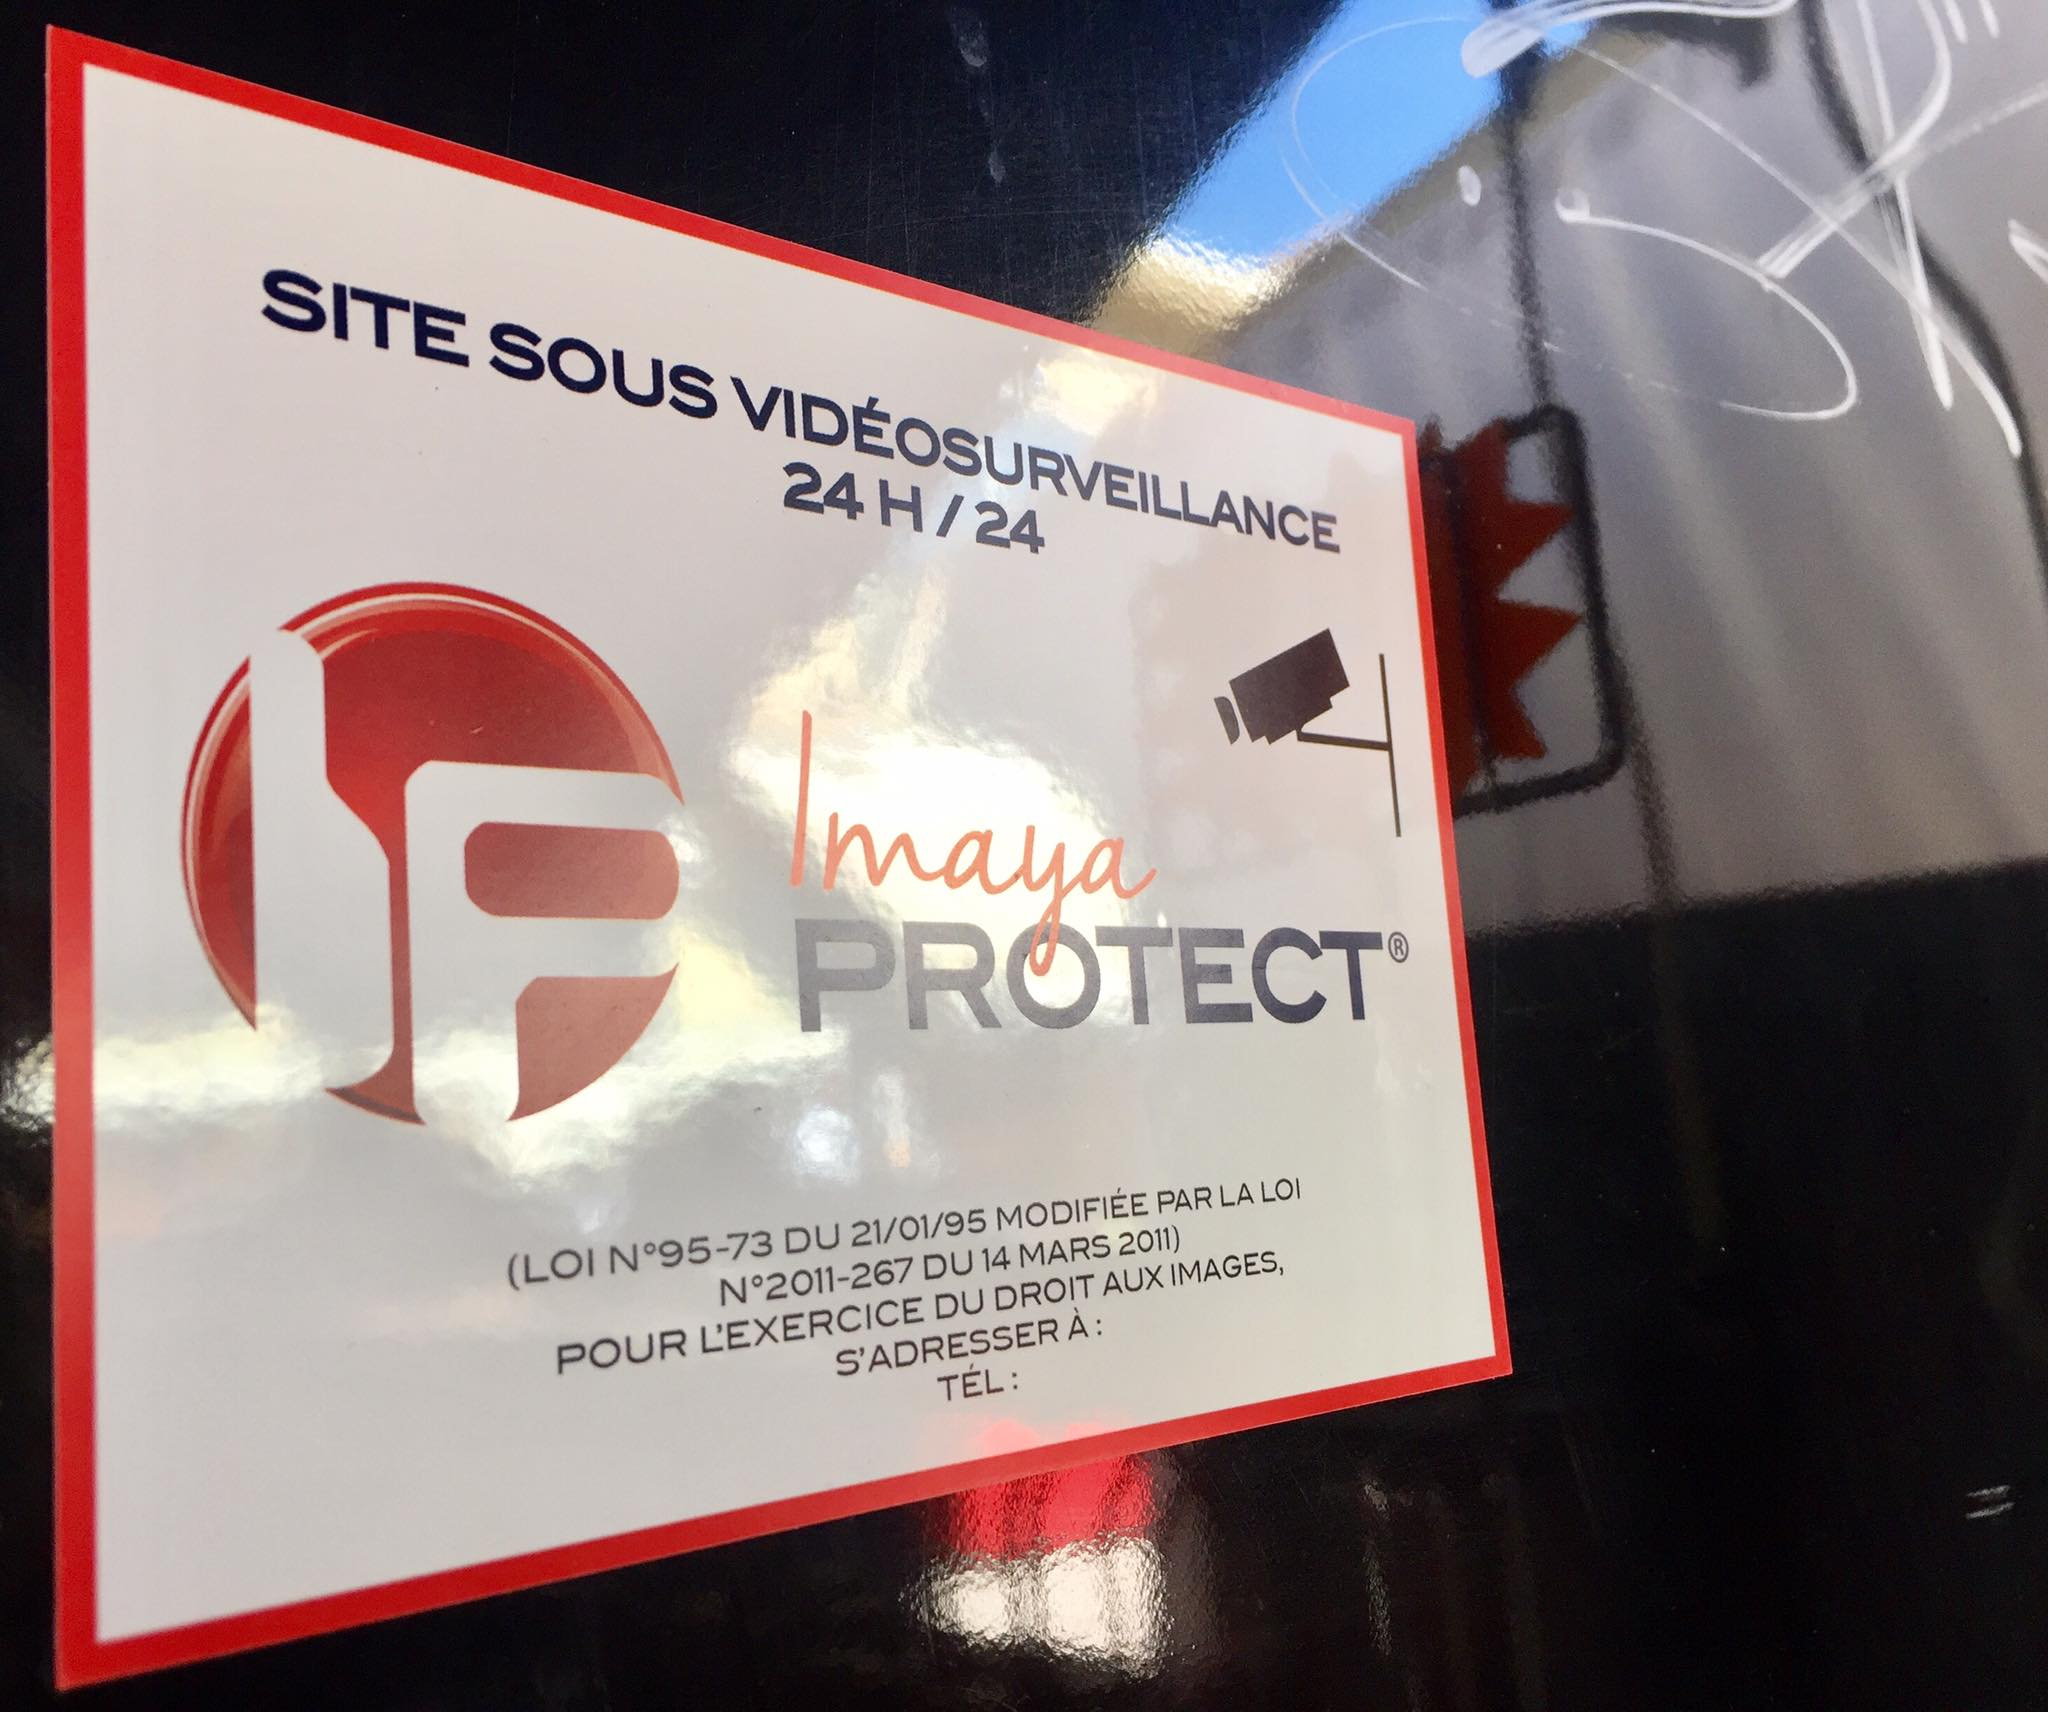 restaurant gepetto grau du roi vidéosurveillance imaya protect